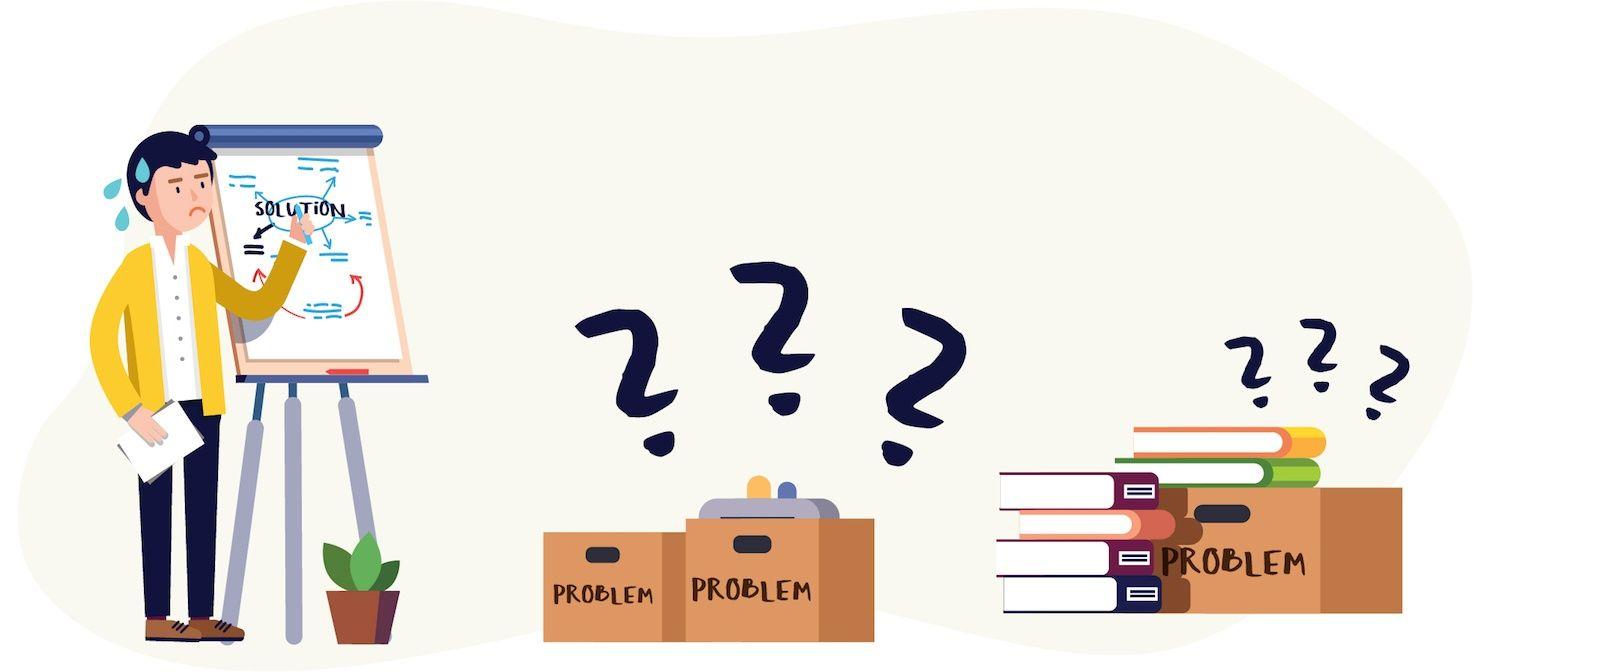 Myth-Scrum Master Must Resolve Every Problem